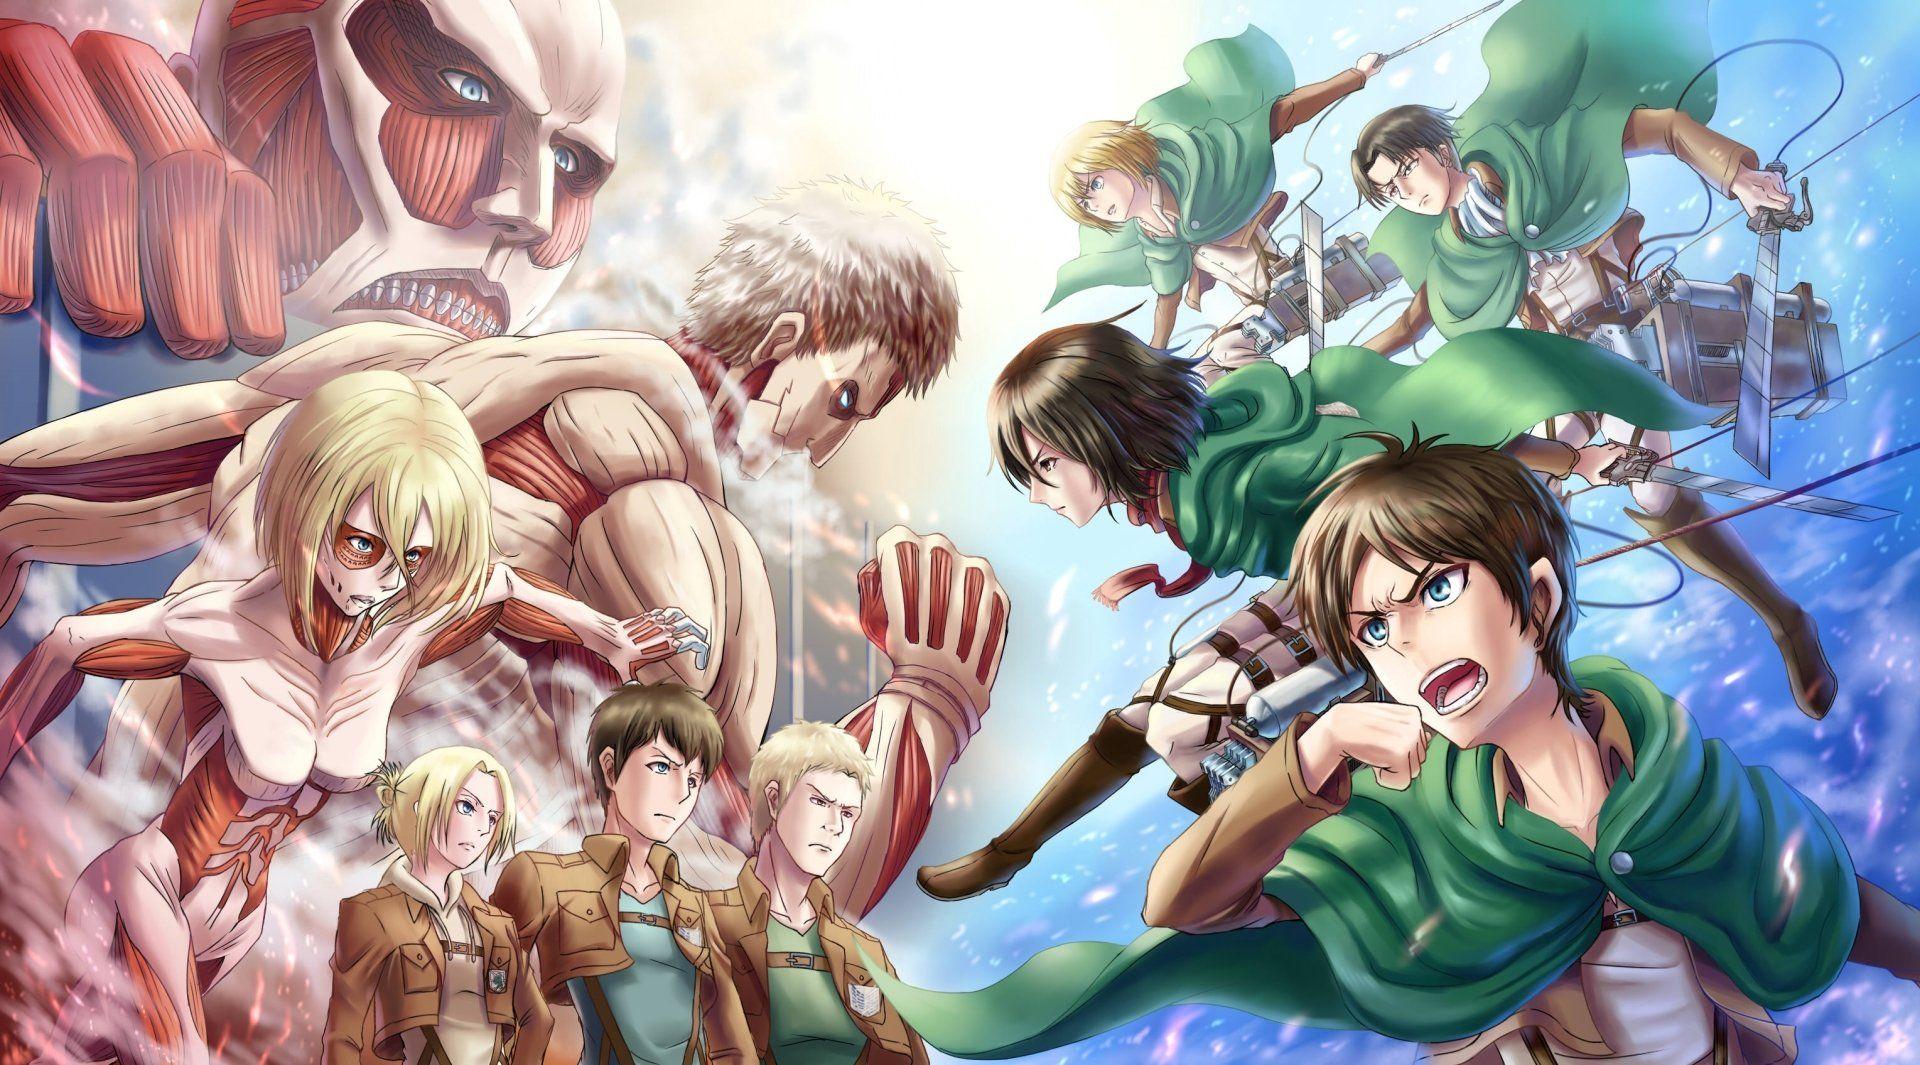 Anime Attack On Titan Eren Yeager Mikasa Ackerman Levi Ackerman Armin Arlert Annie Leonhart Bertolt Hoover Reiner Bra Anime Attack On Titan Hd Anime Wallpapers